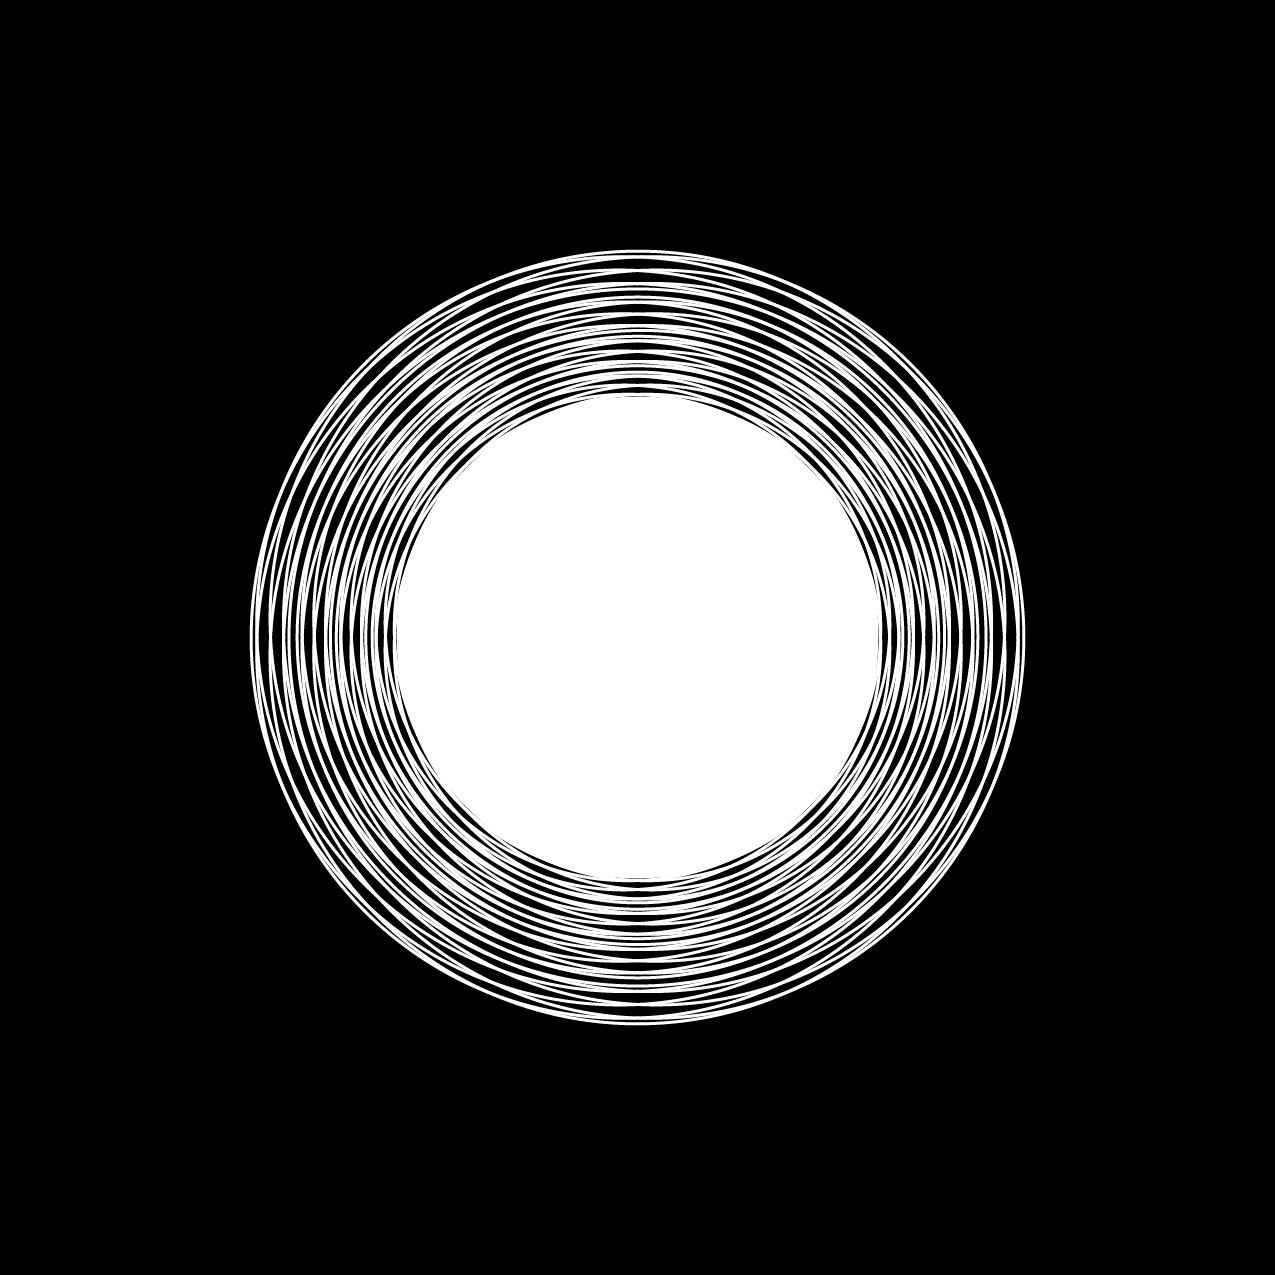 Letter O7 Design by Furia